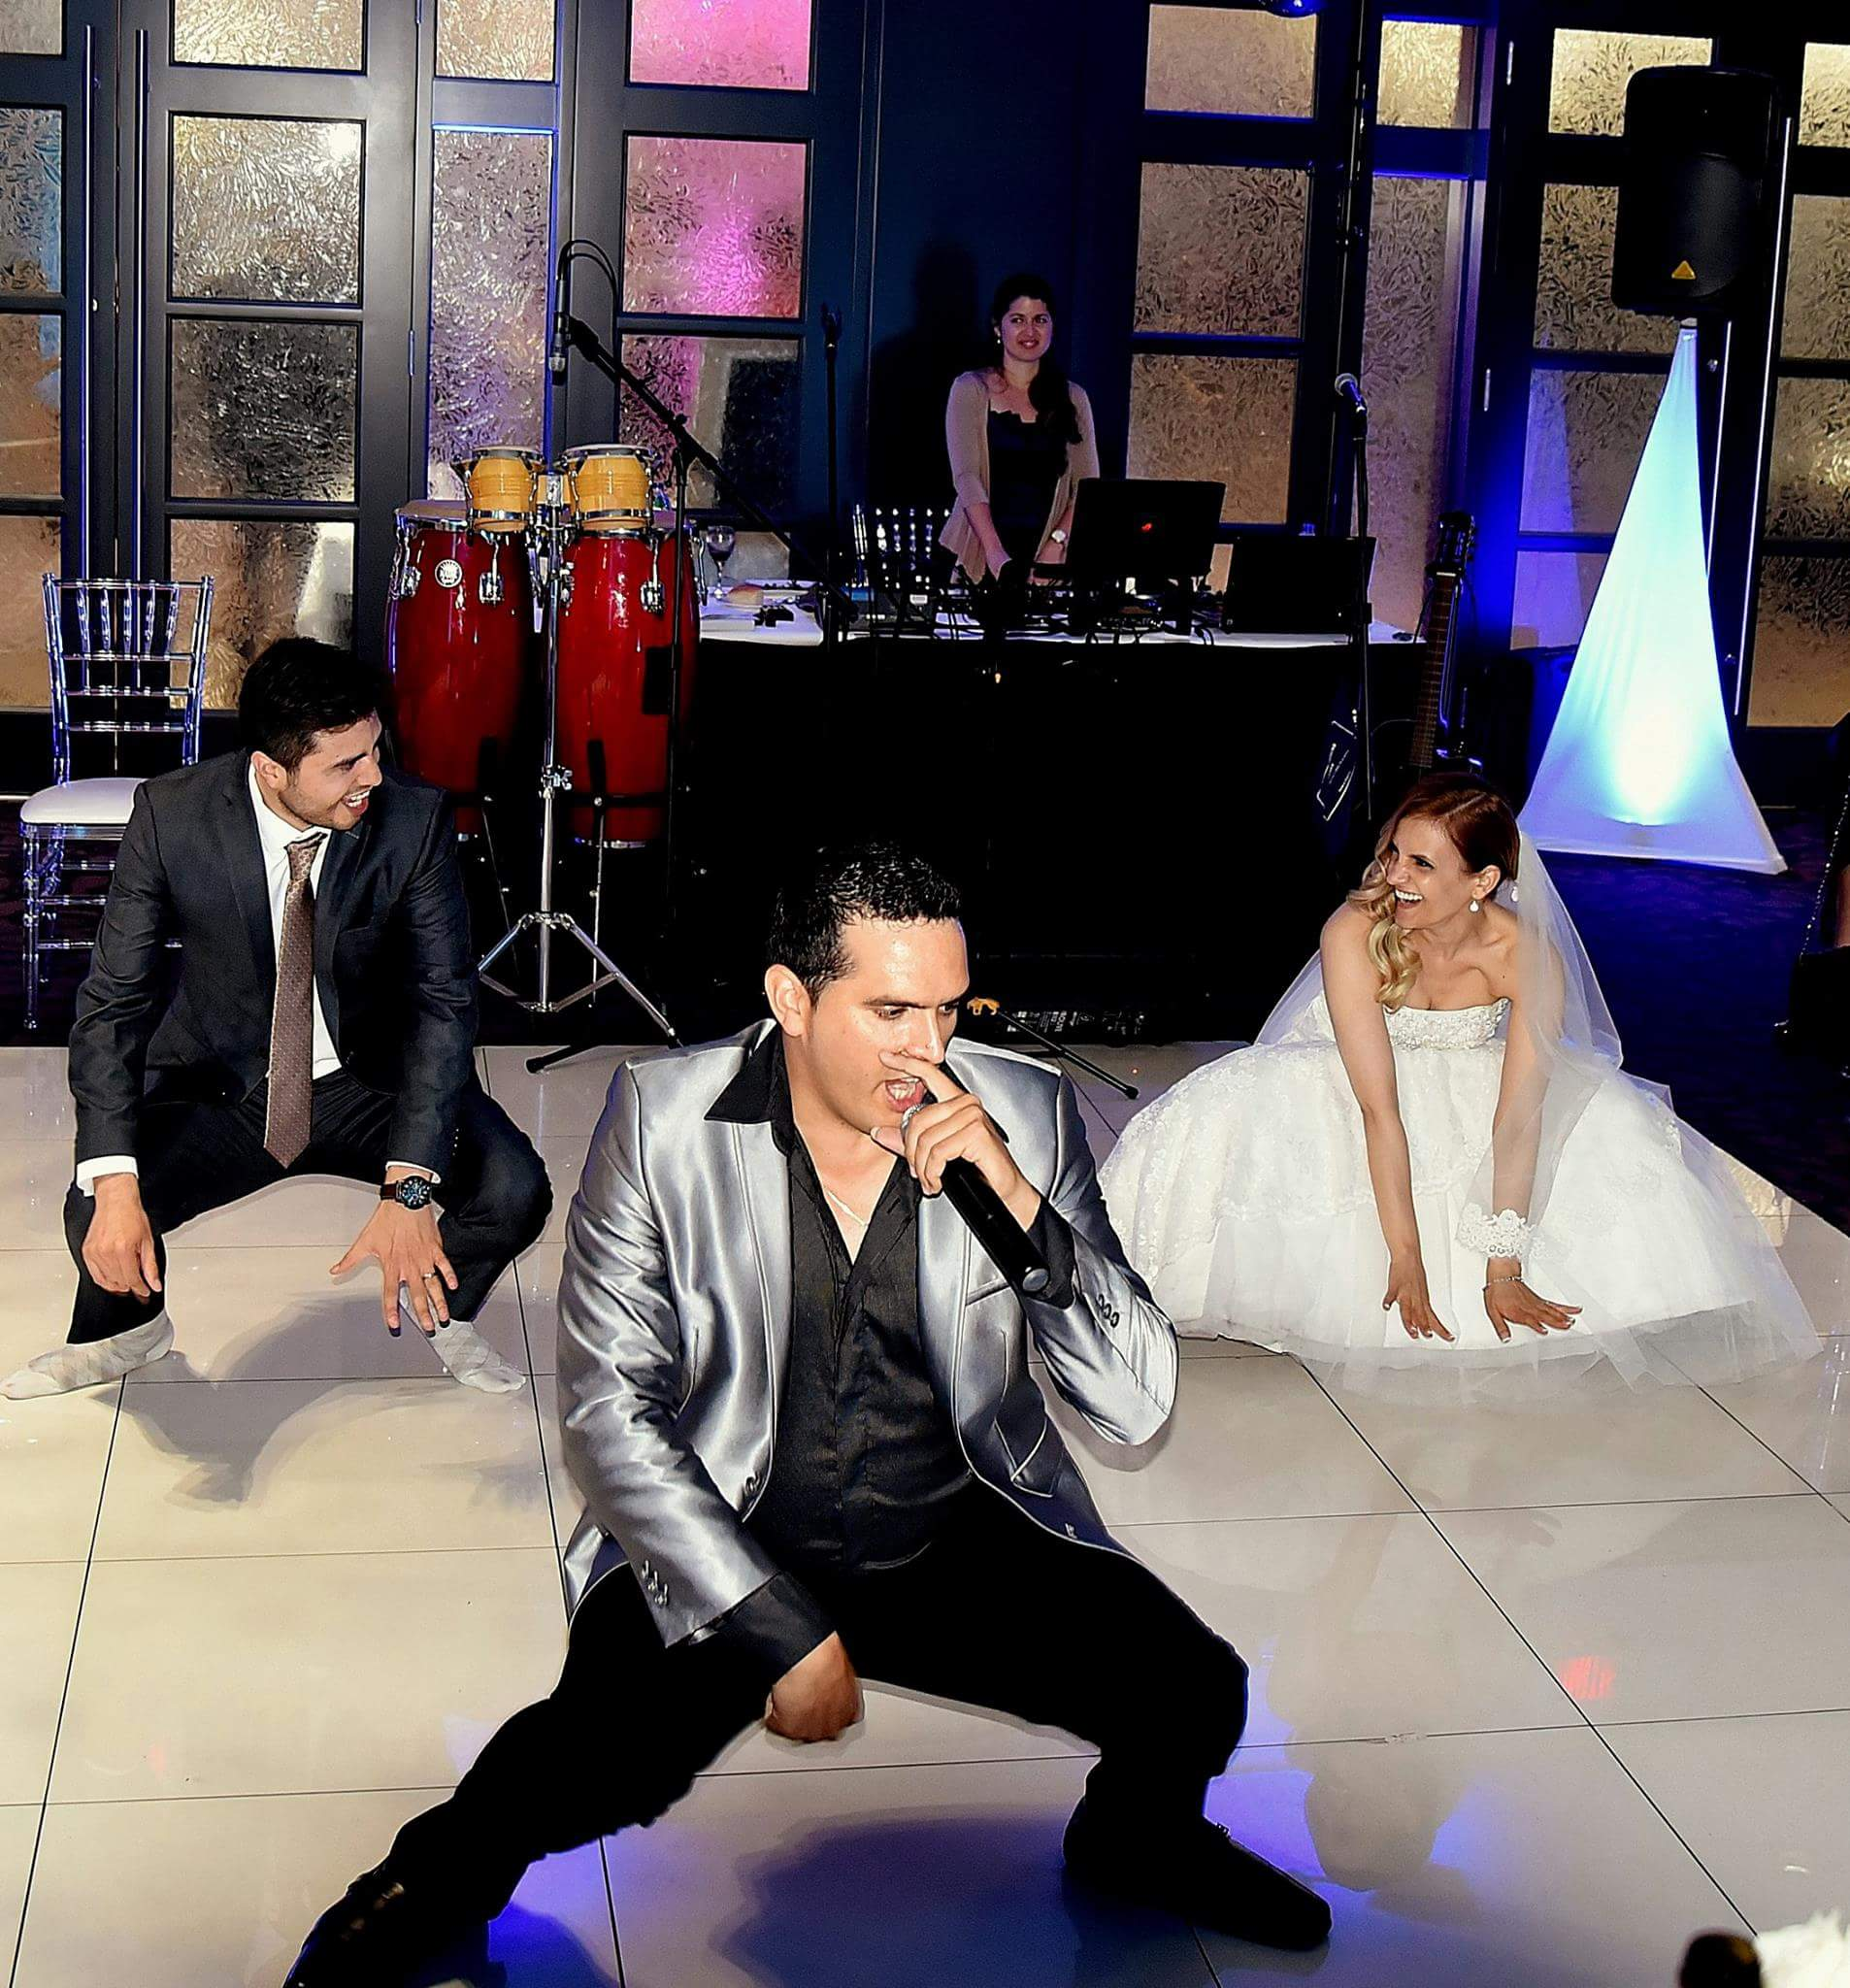 Dj mariage Disco mobile Dj aniation mariage (1)